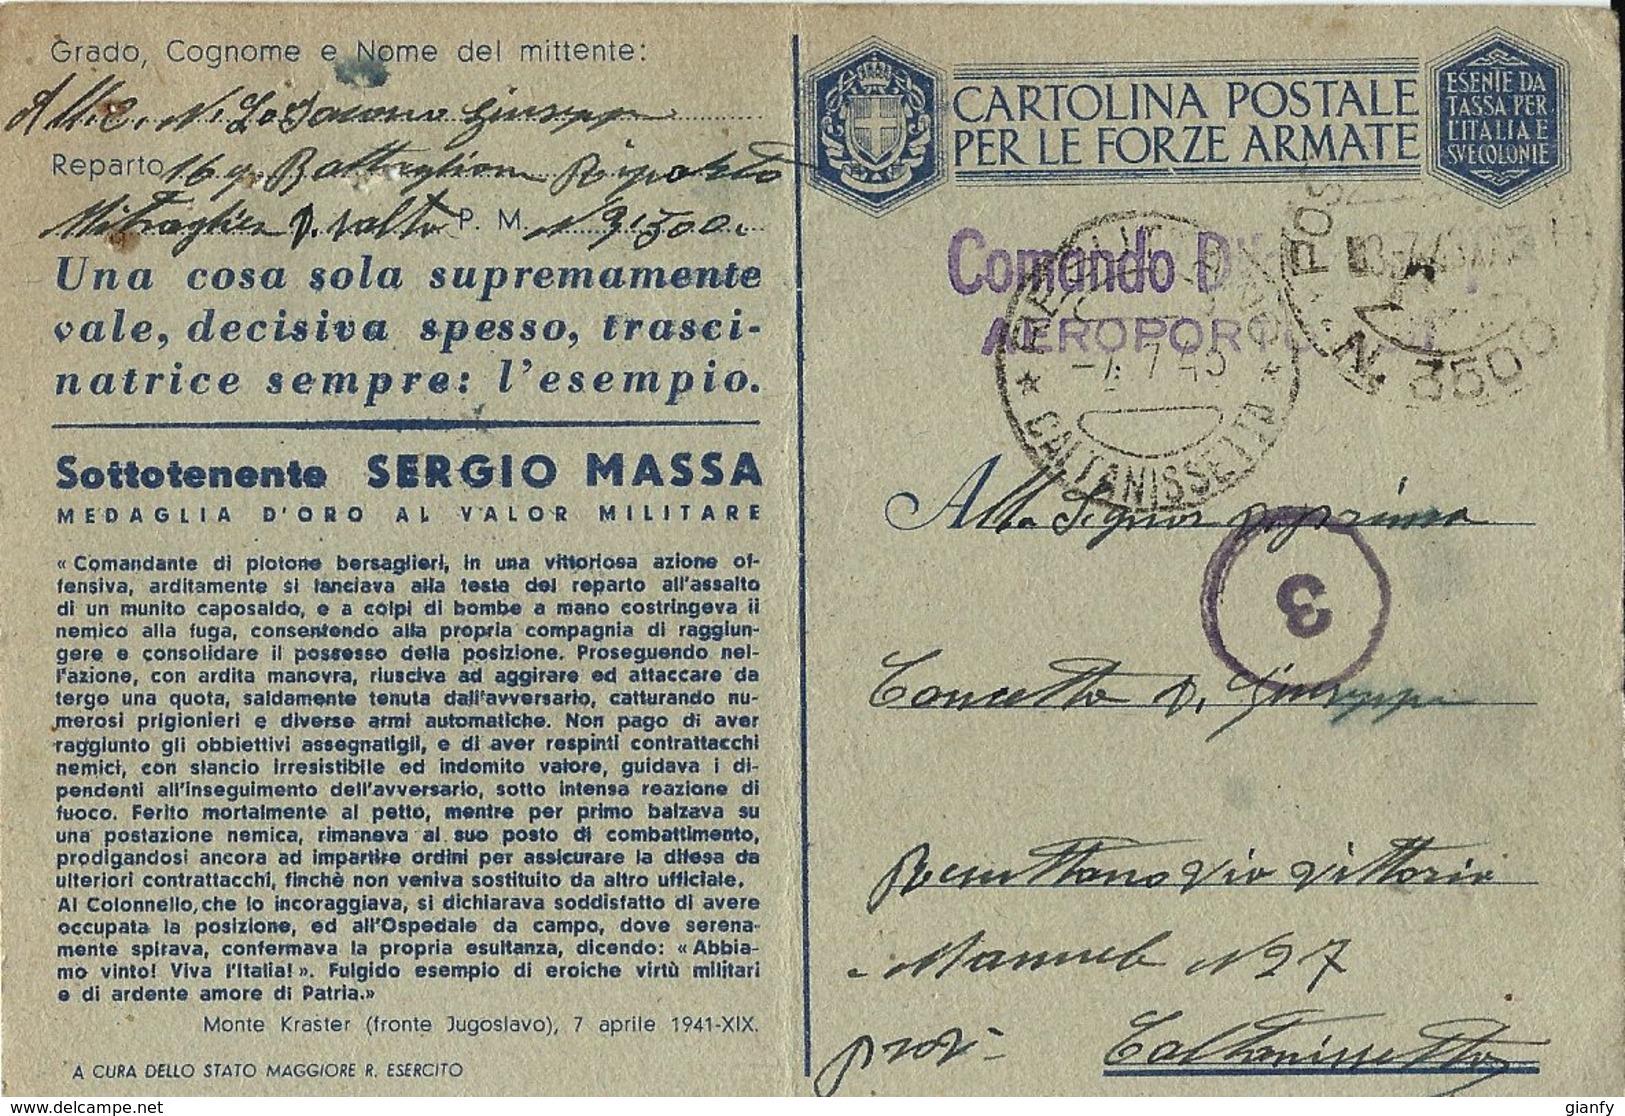 FRANCHIGIA WWII POSTA MILITARE 3500 1943 CONC MESSINA X RESUTTANO MEDAGLIA ORO MASSA - Military Mail (PM)